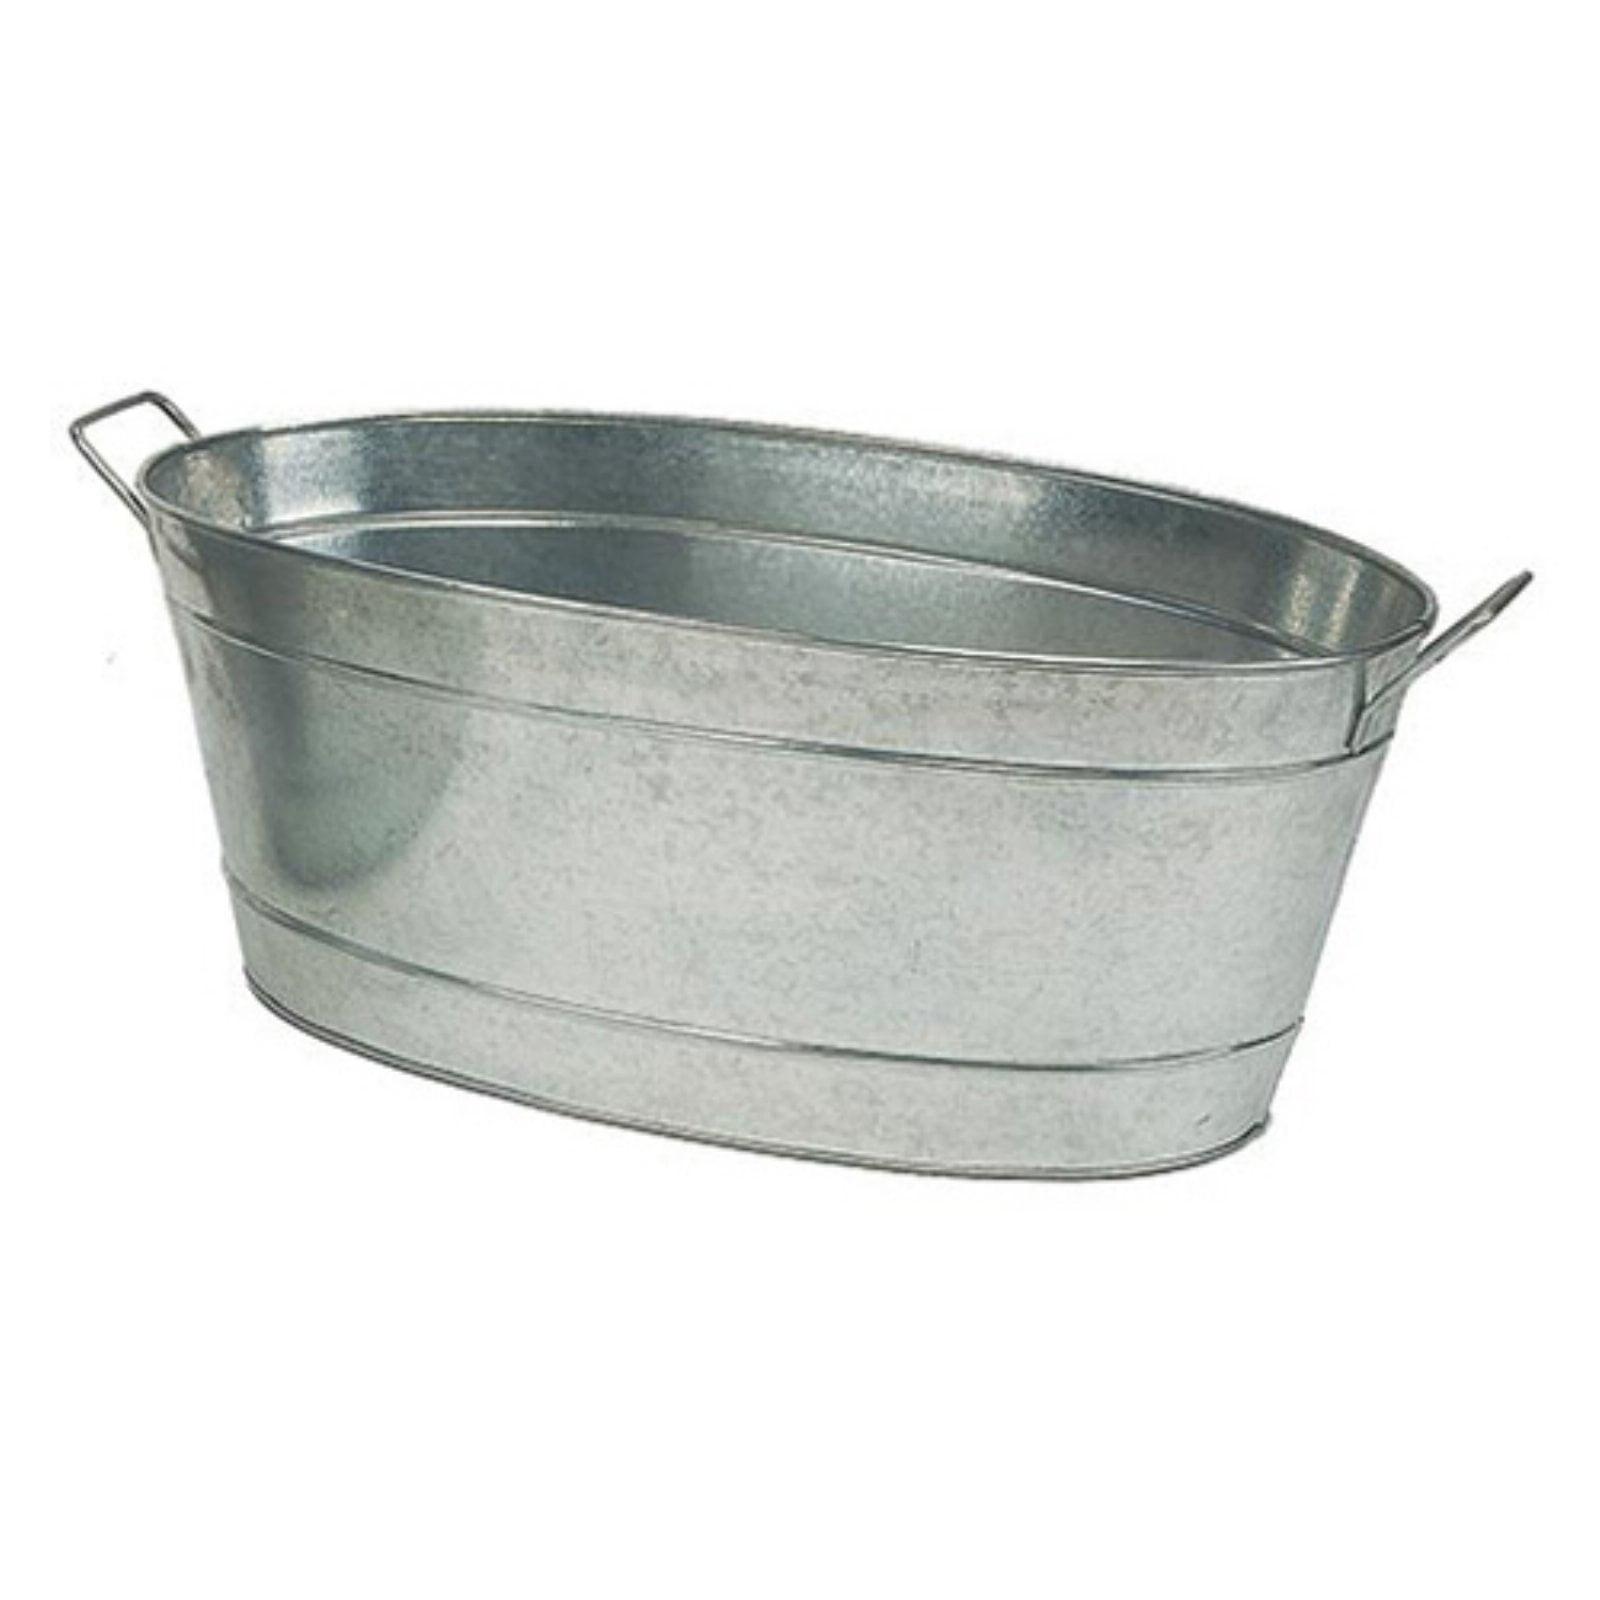 Achla Designs Large Oval Steel Planting Tub